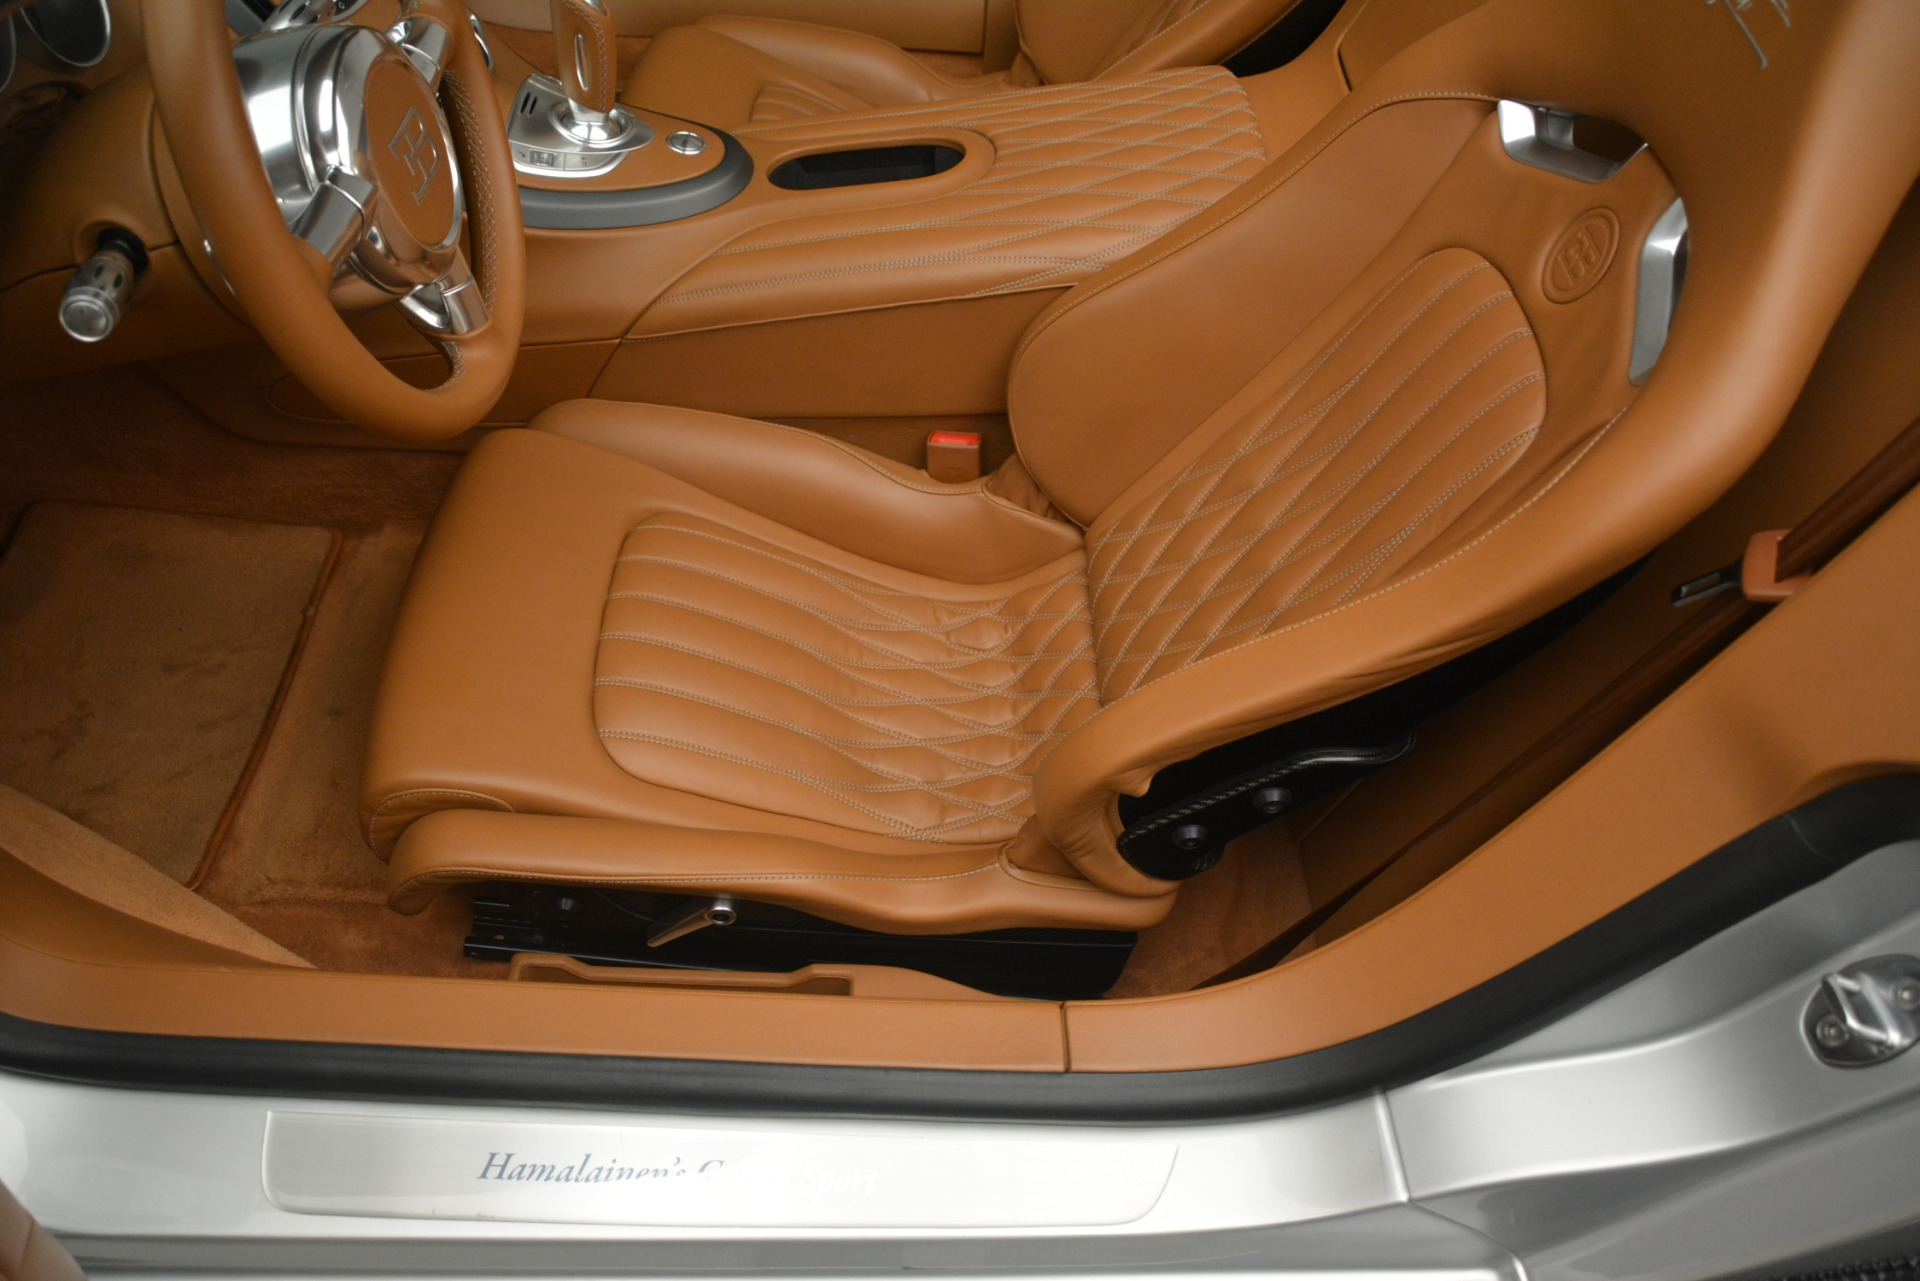 Used 2010 Bugatti Veyron 16.4 Grand Sport For Sale In Greenwich, CT 3159_p27